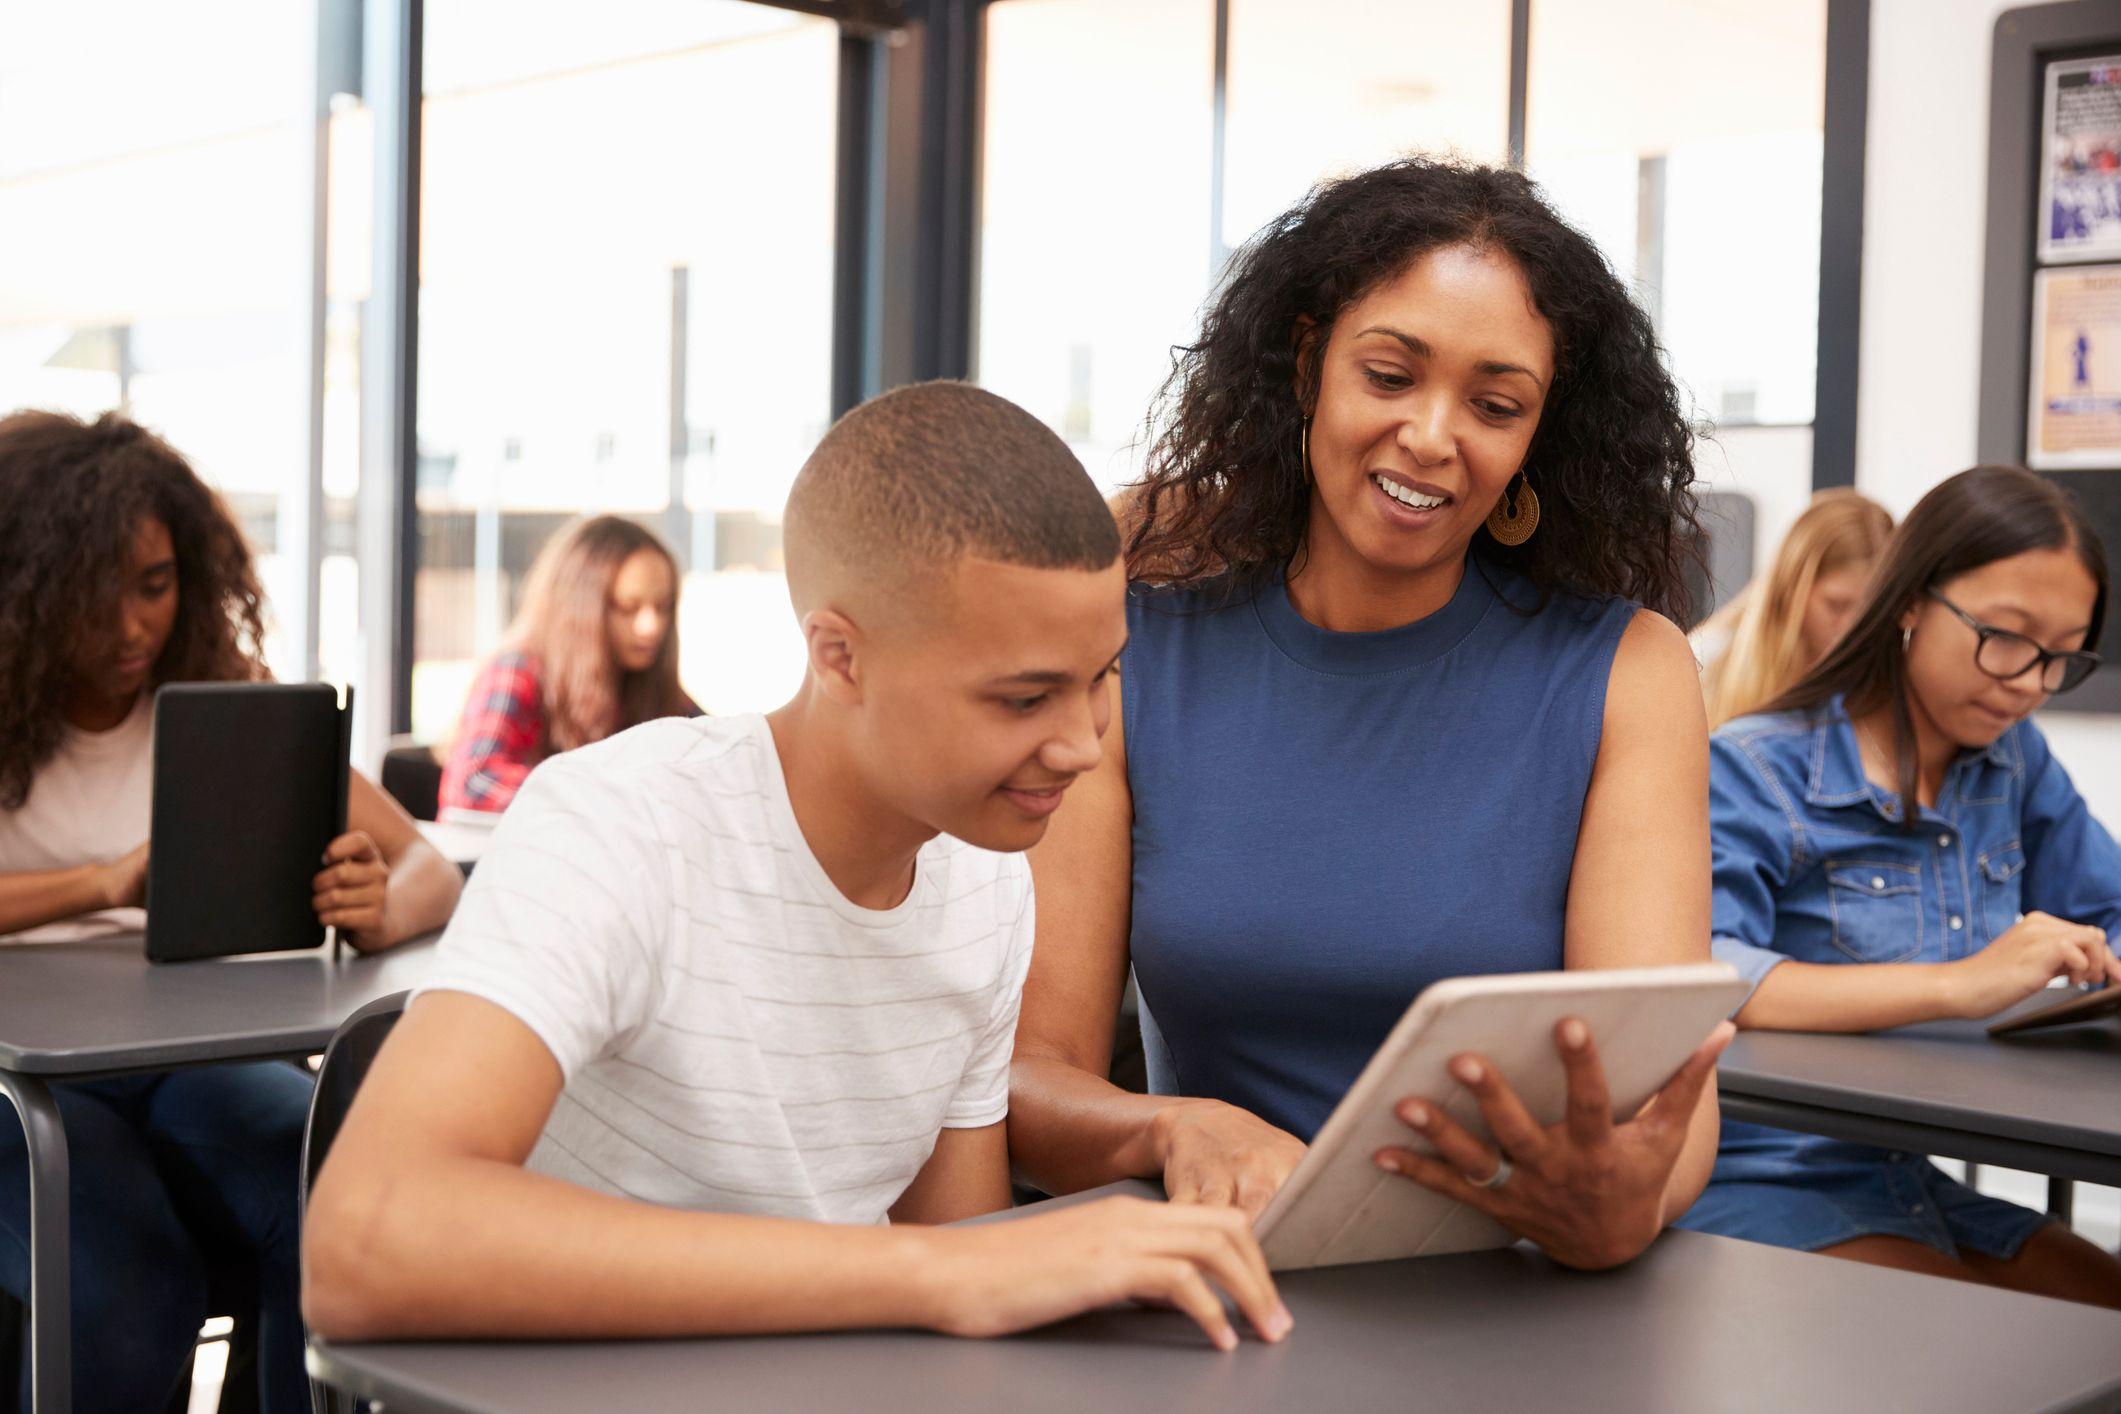 A teacher helps a teenage student